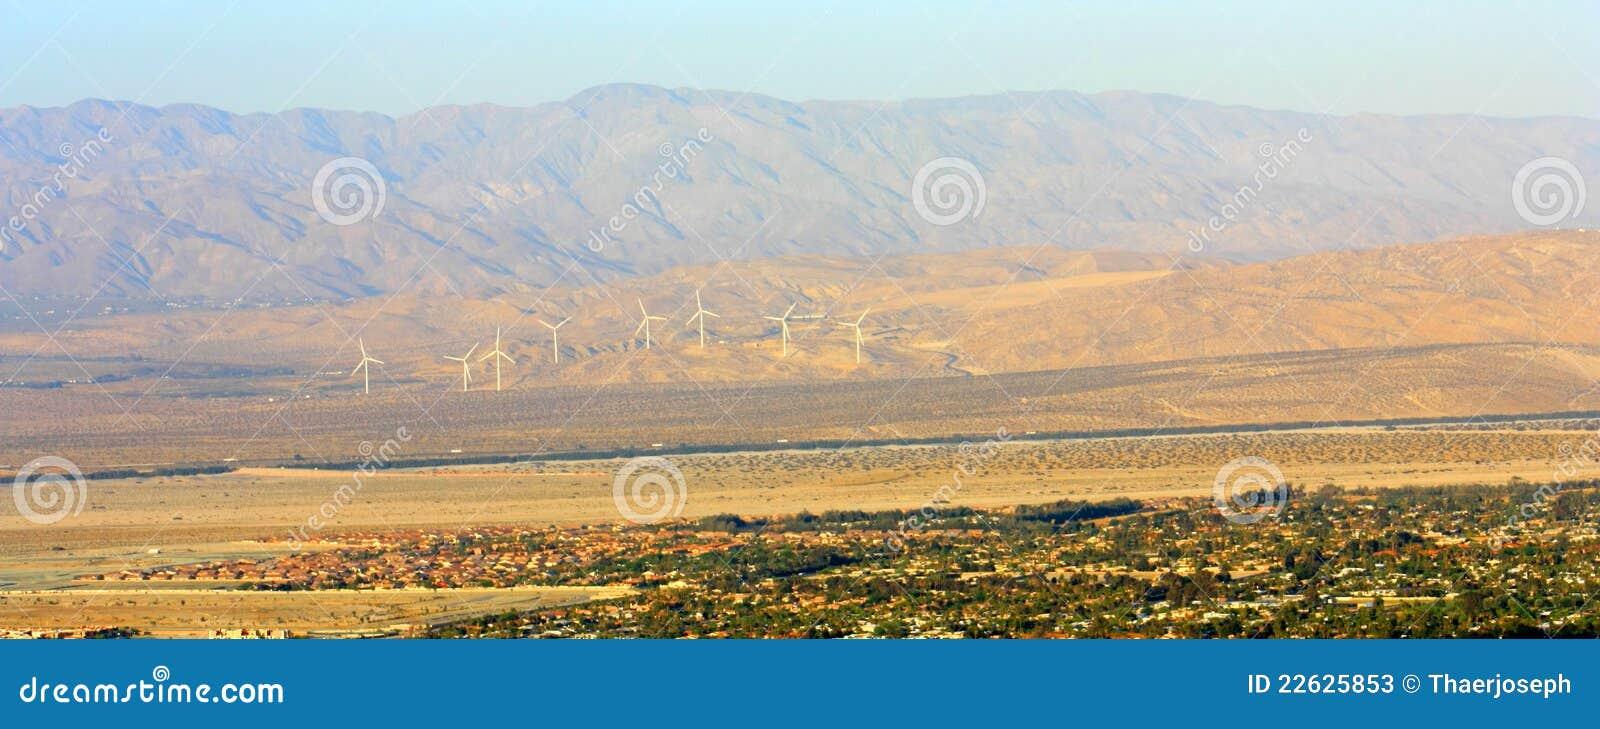 Landscape Designe Business Palm Springs